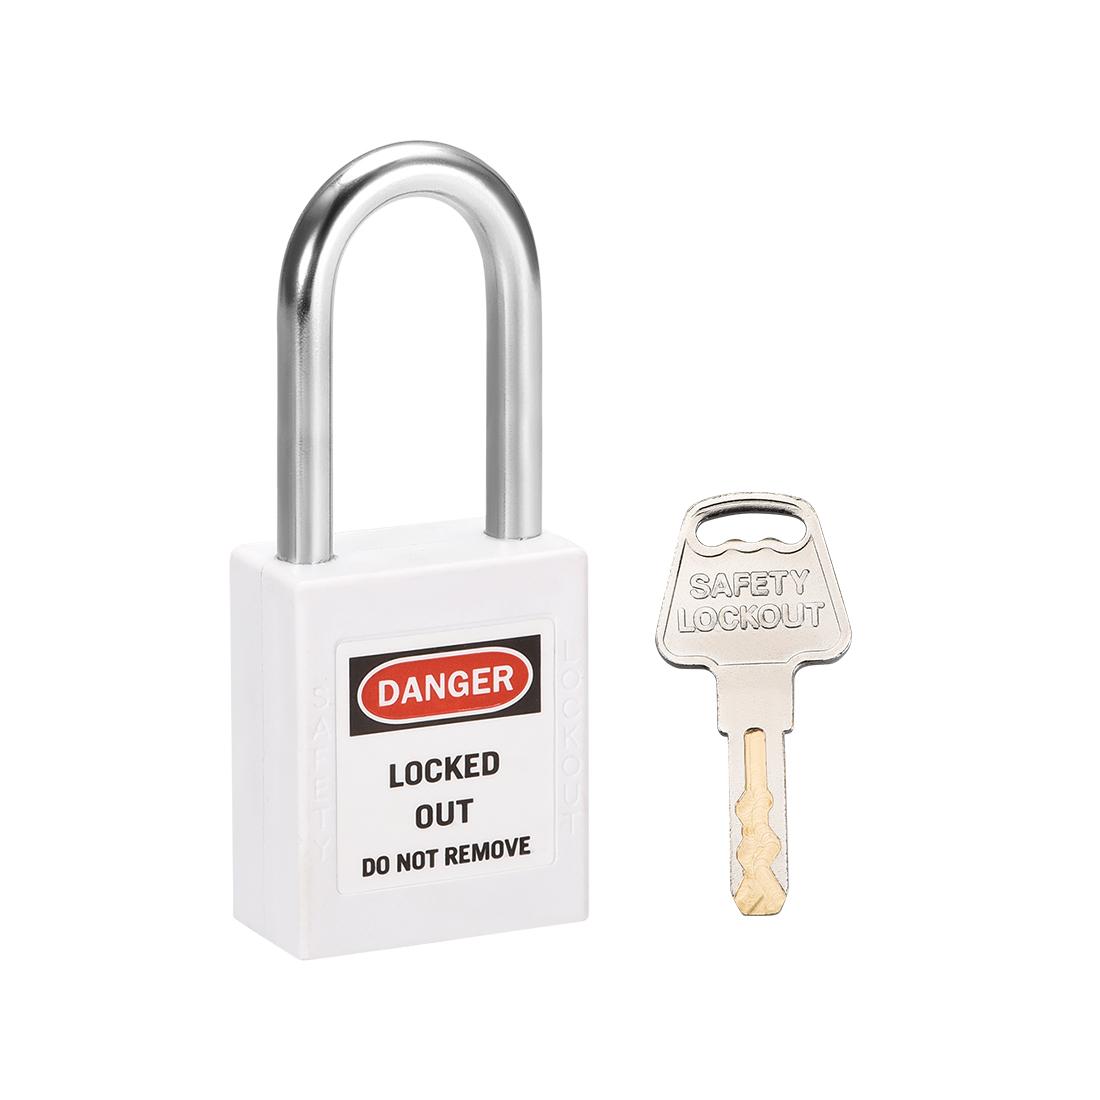 Lockout Tagout Locks 1-1/2 Inch Shackle Key Alike Safety Padlock Plastic White